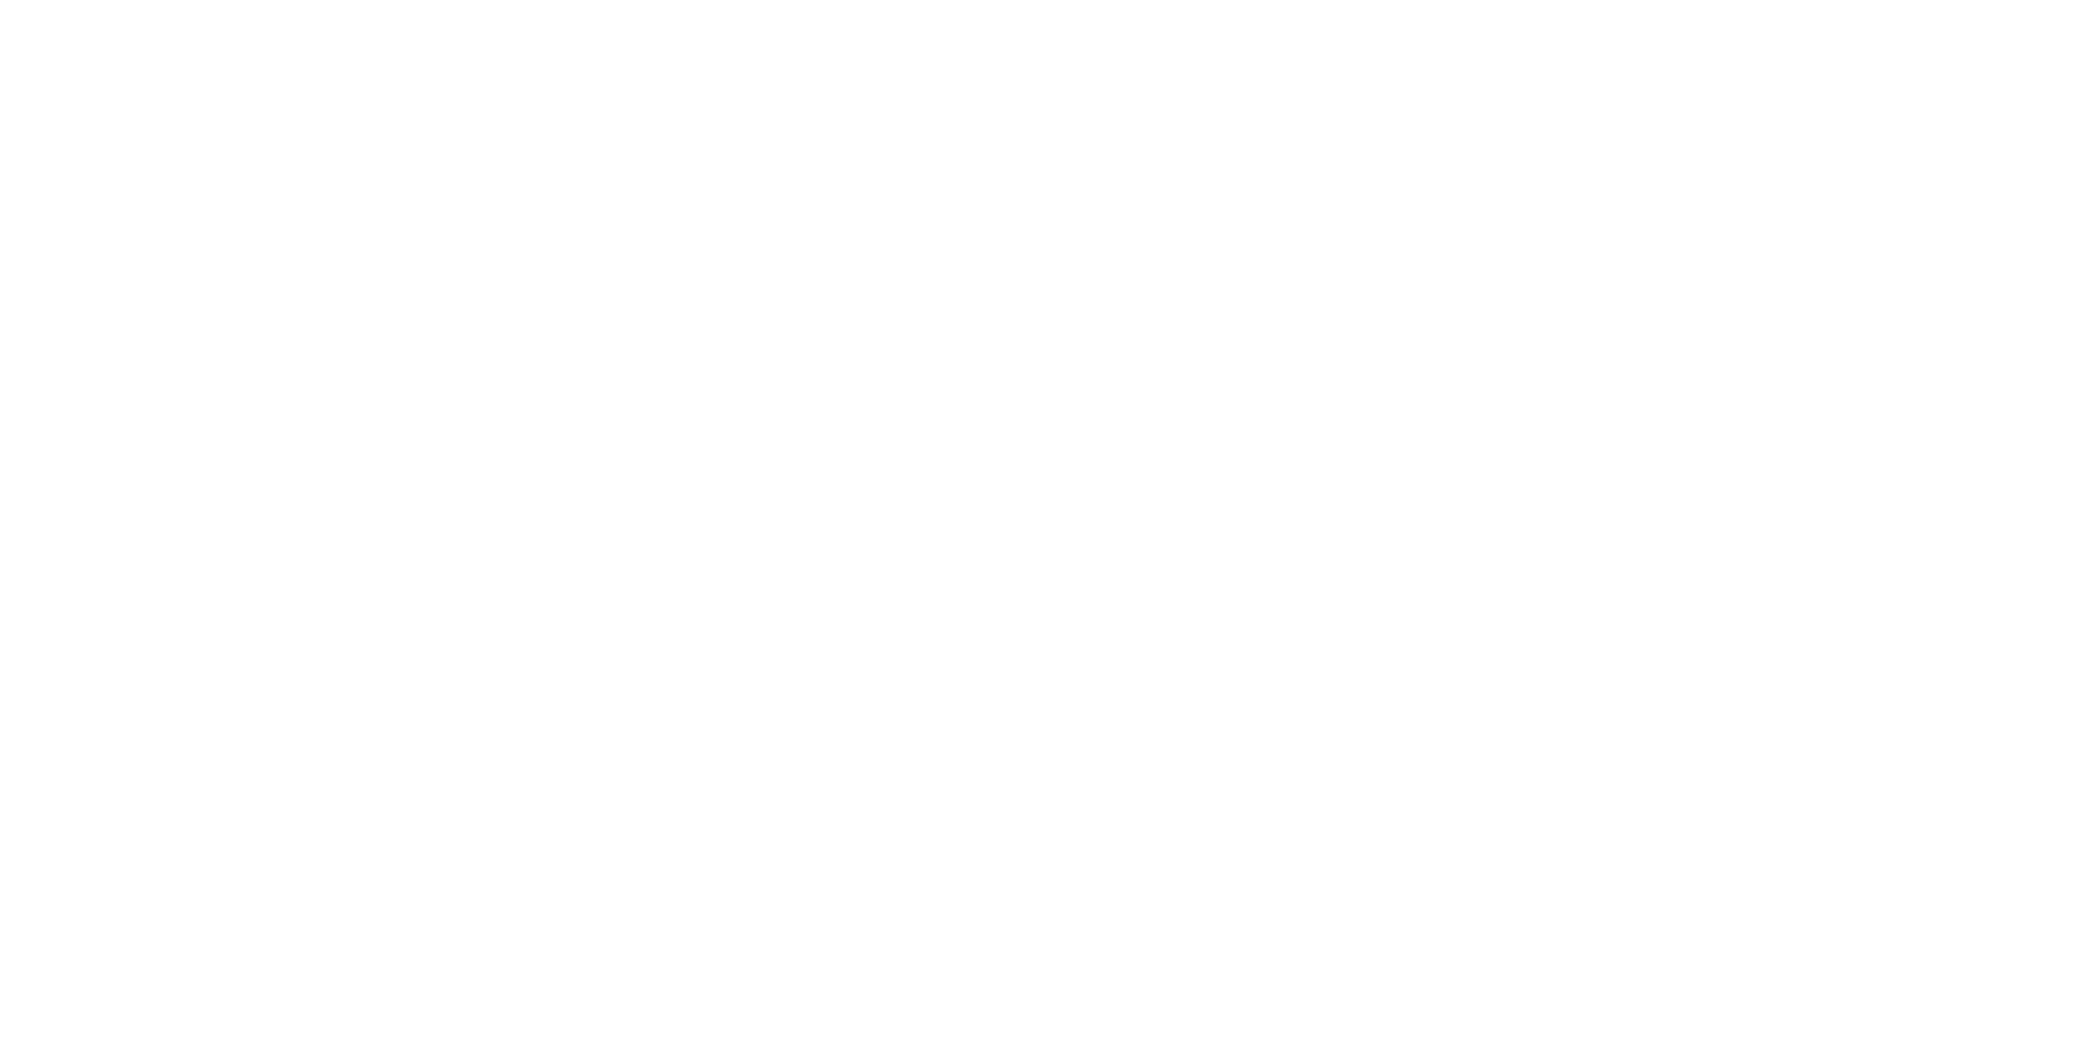 DRK Pflegeheim Lübbersdorf